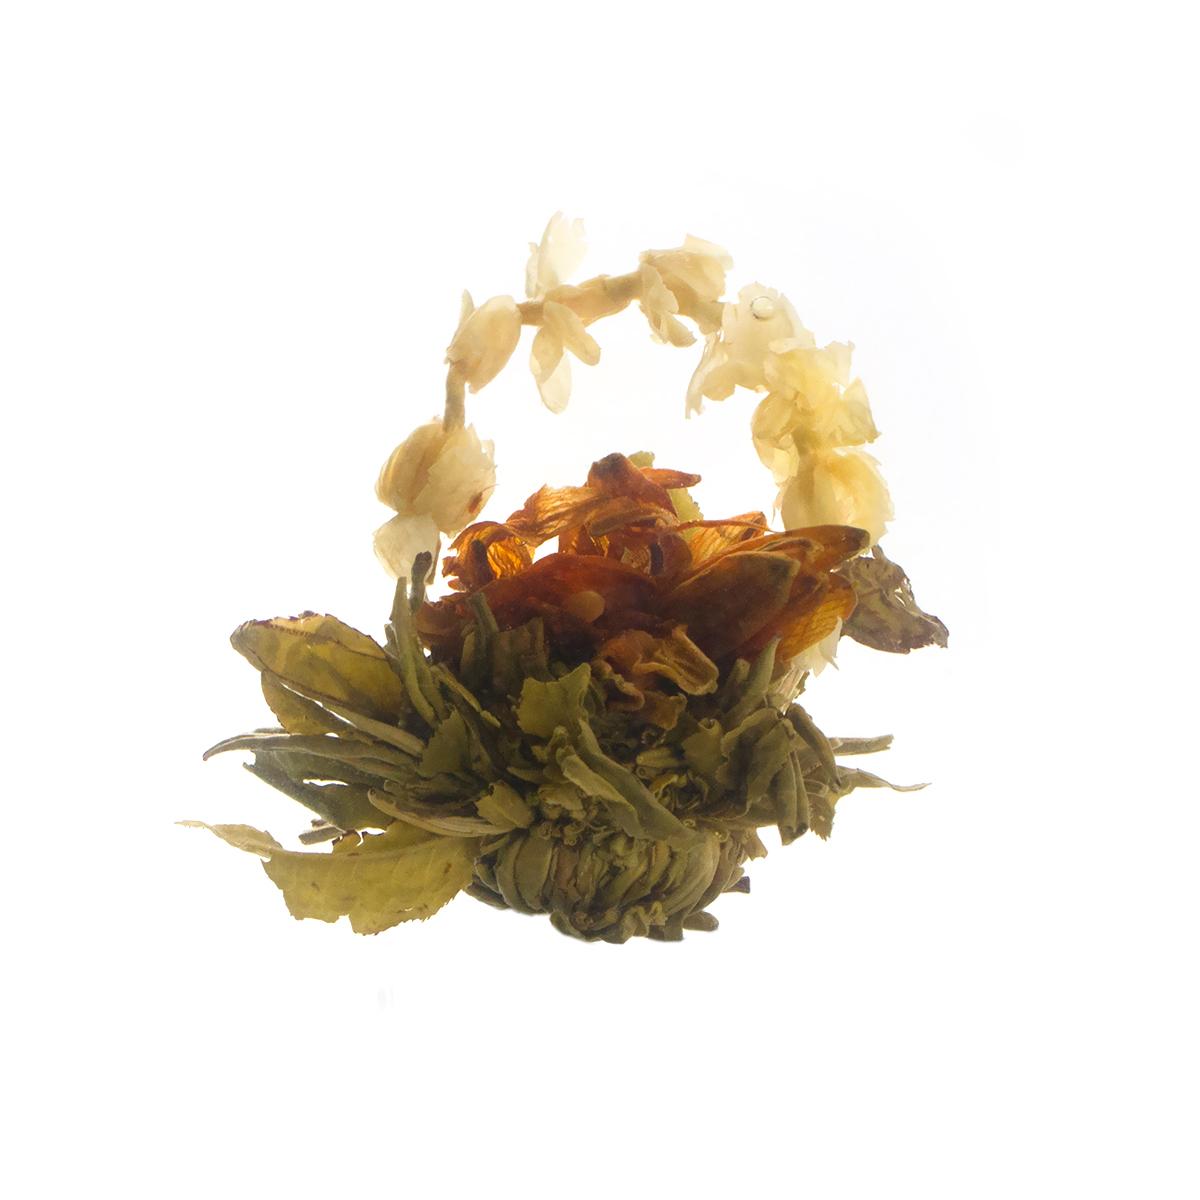 Связанный чай Бай Хуа Сян Цзы (Лунный сад, аромат жасмина) в инд. упаковке